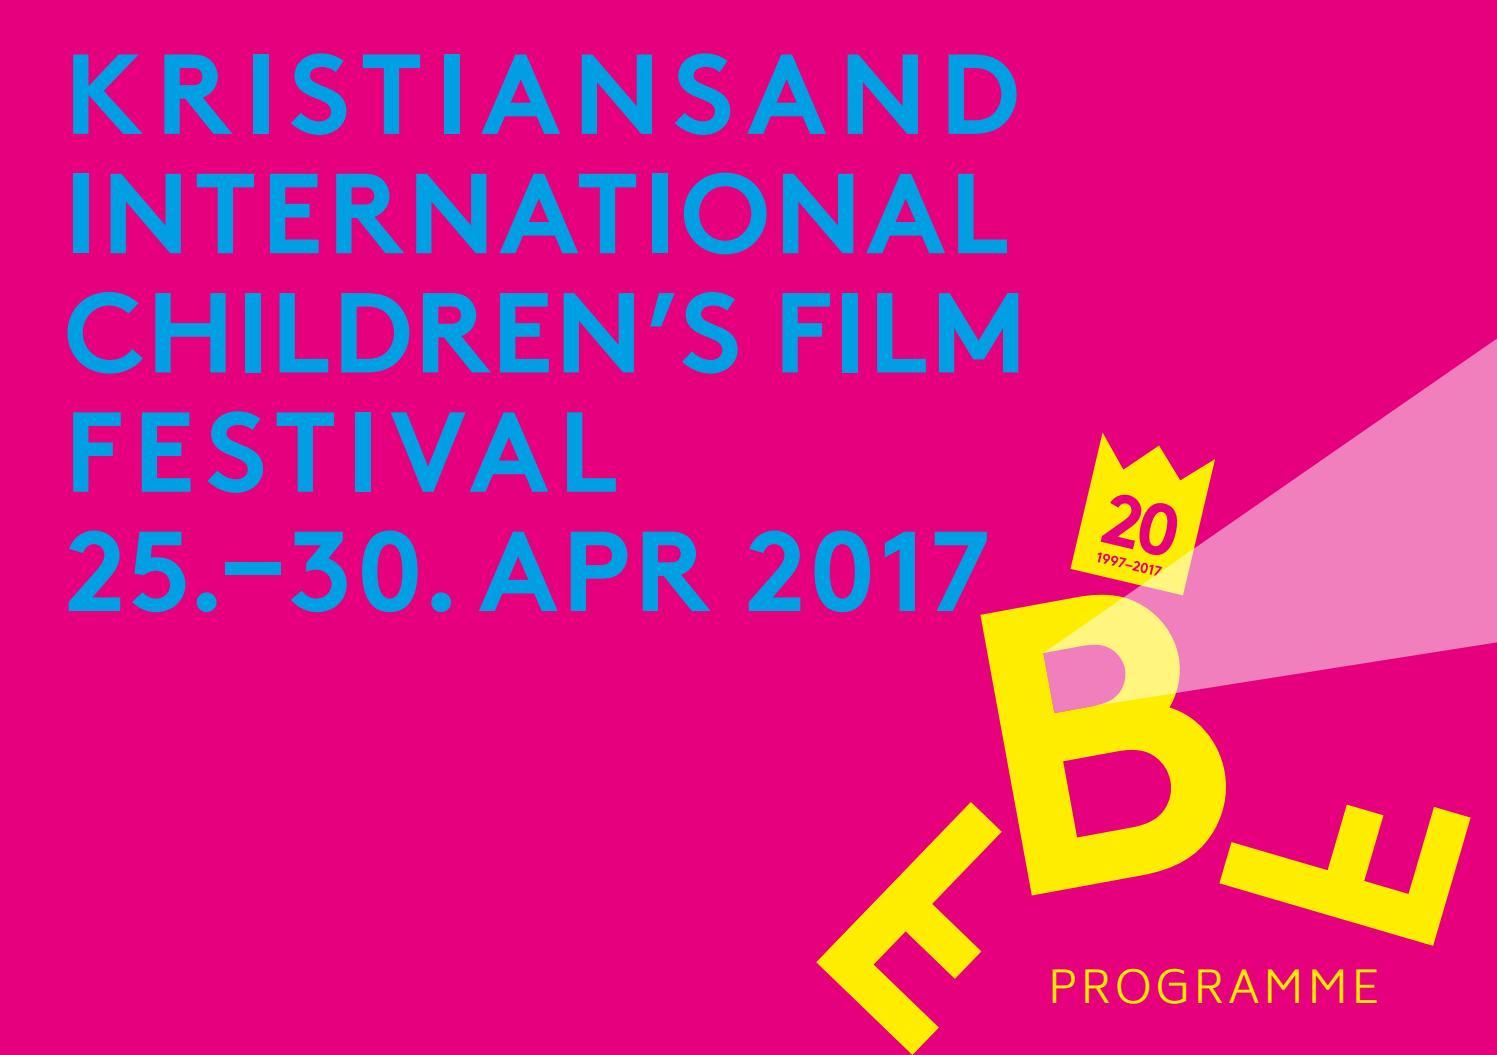 casperand 39 s scare school ra. kristiansand international children\u0027s film festival program 2017 by barnefilmfestivalen - issuu casperand 39 s scare school ra